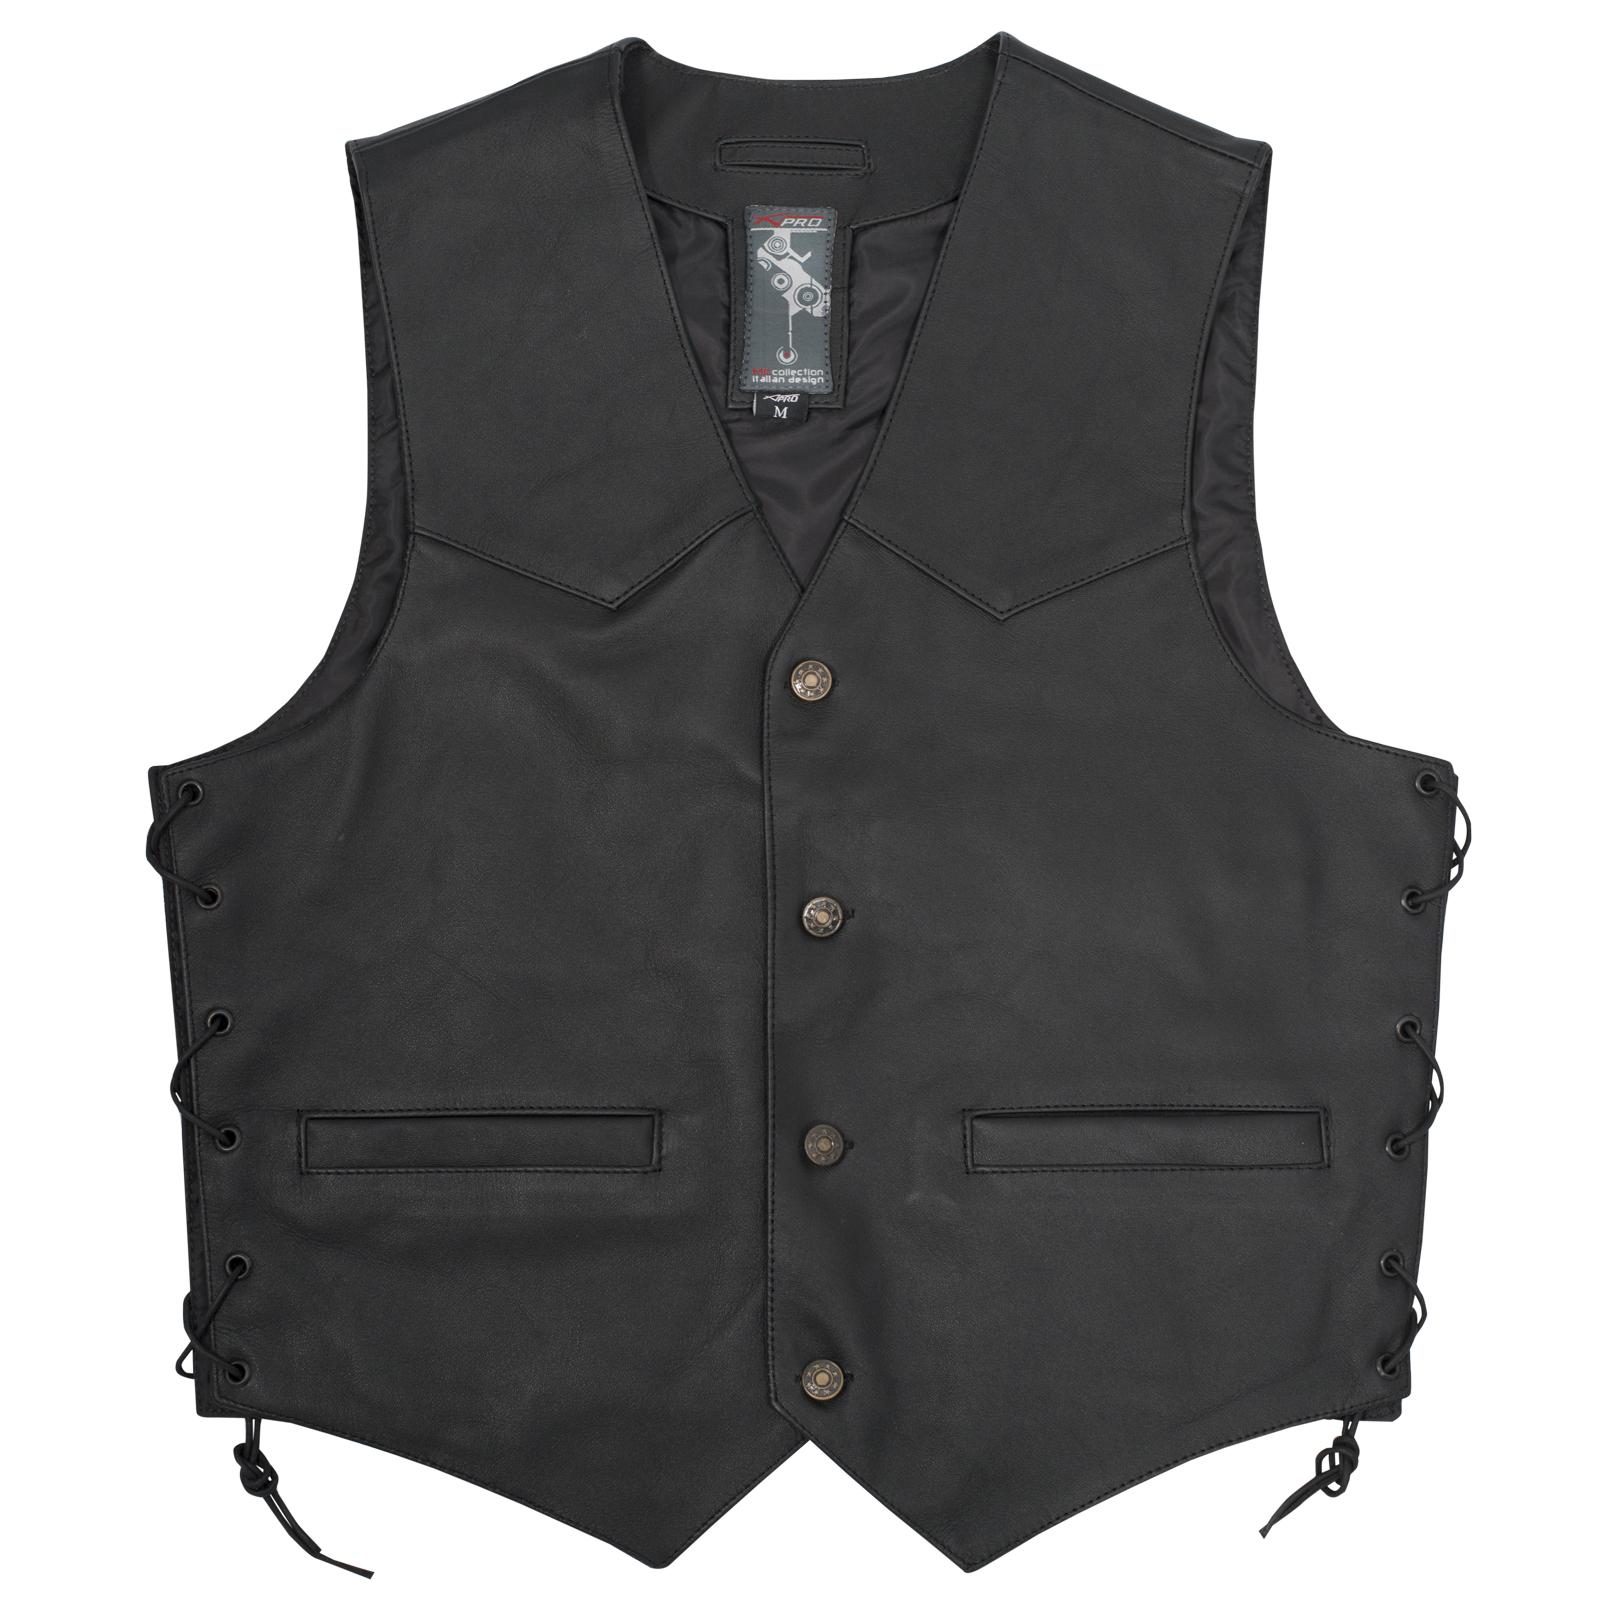 gilet cuir moto motard chopper custom boutons lacets fashion noir m ebay. Black Bedroom Furniture Sets. Home Design Ideas